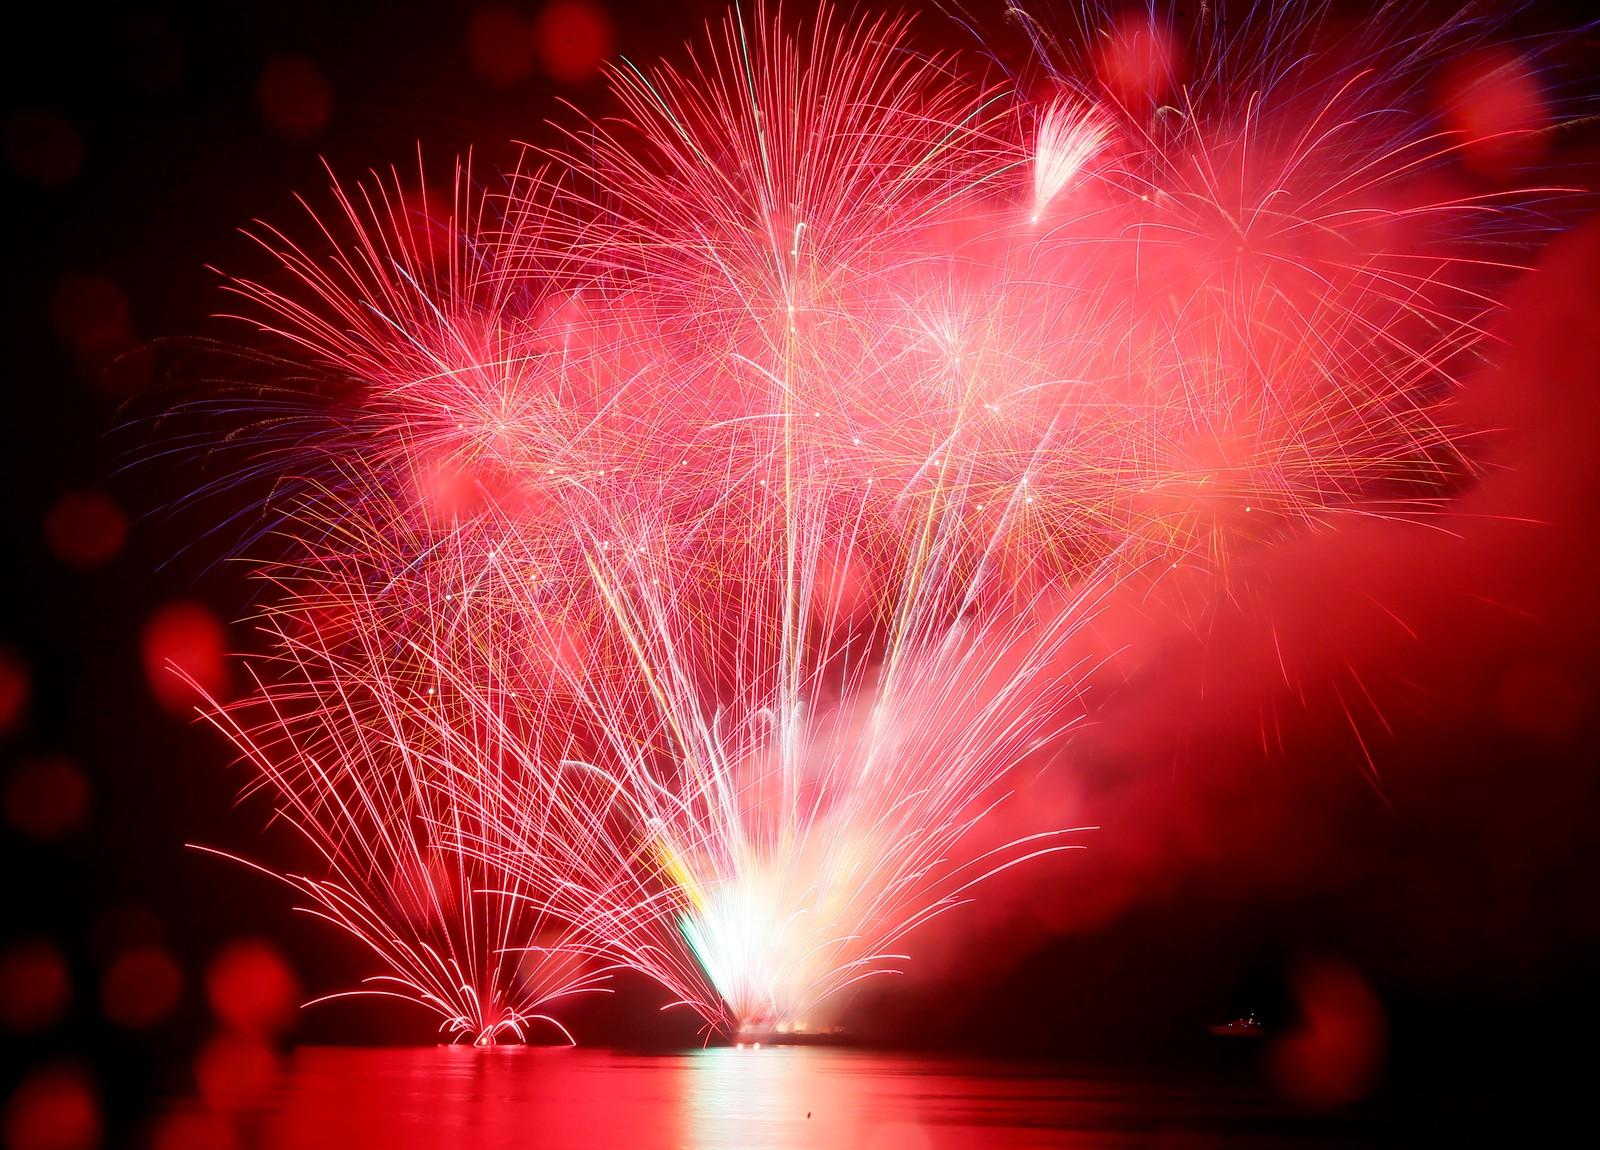 Her feirer filippinere feirer inngangen til det nye året i landets hovedstad Manila.